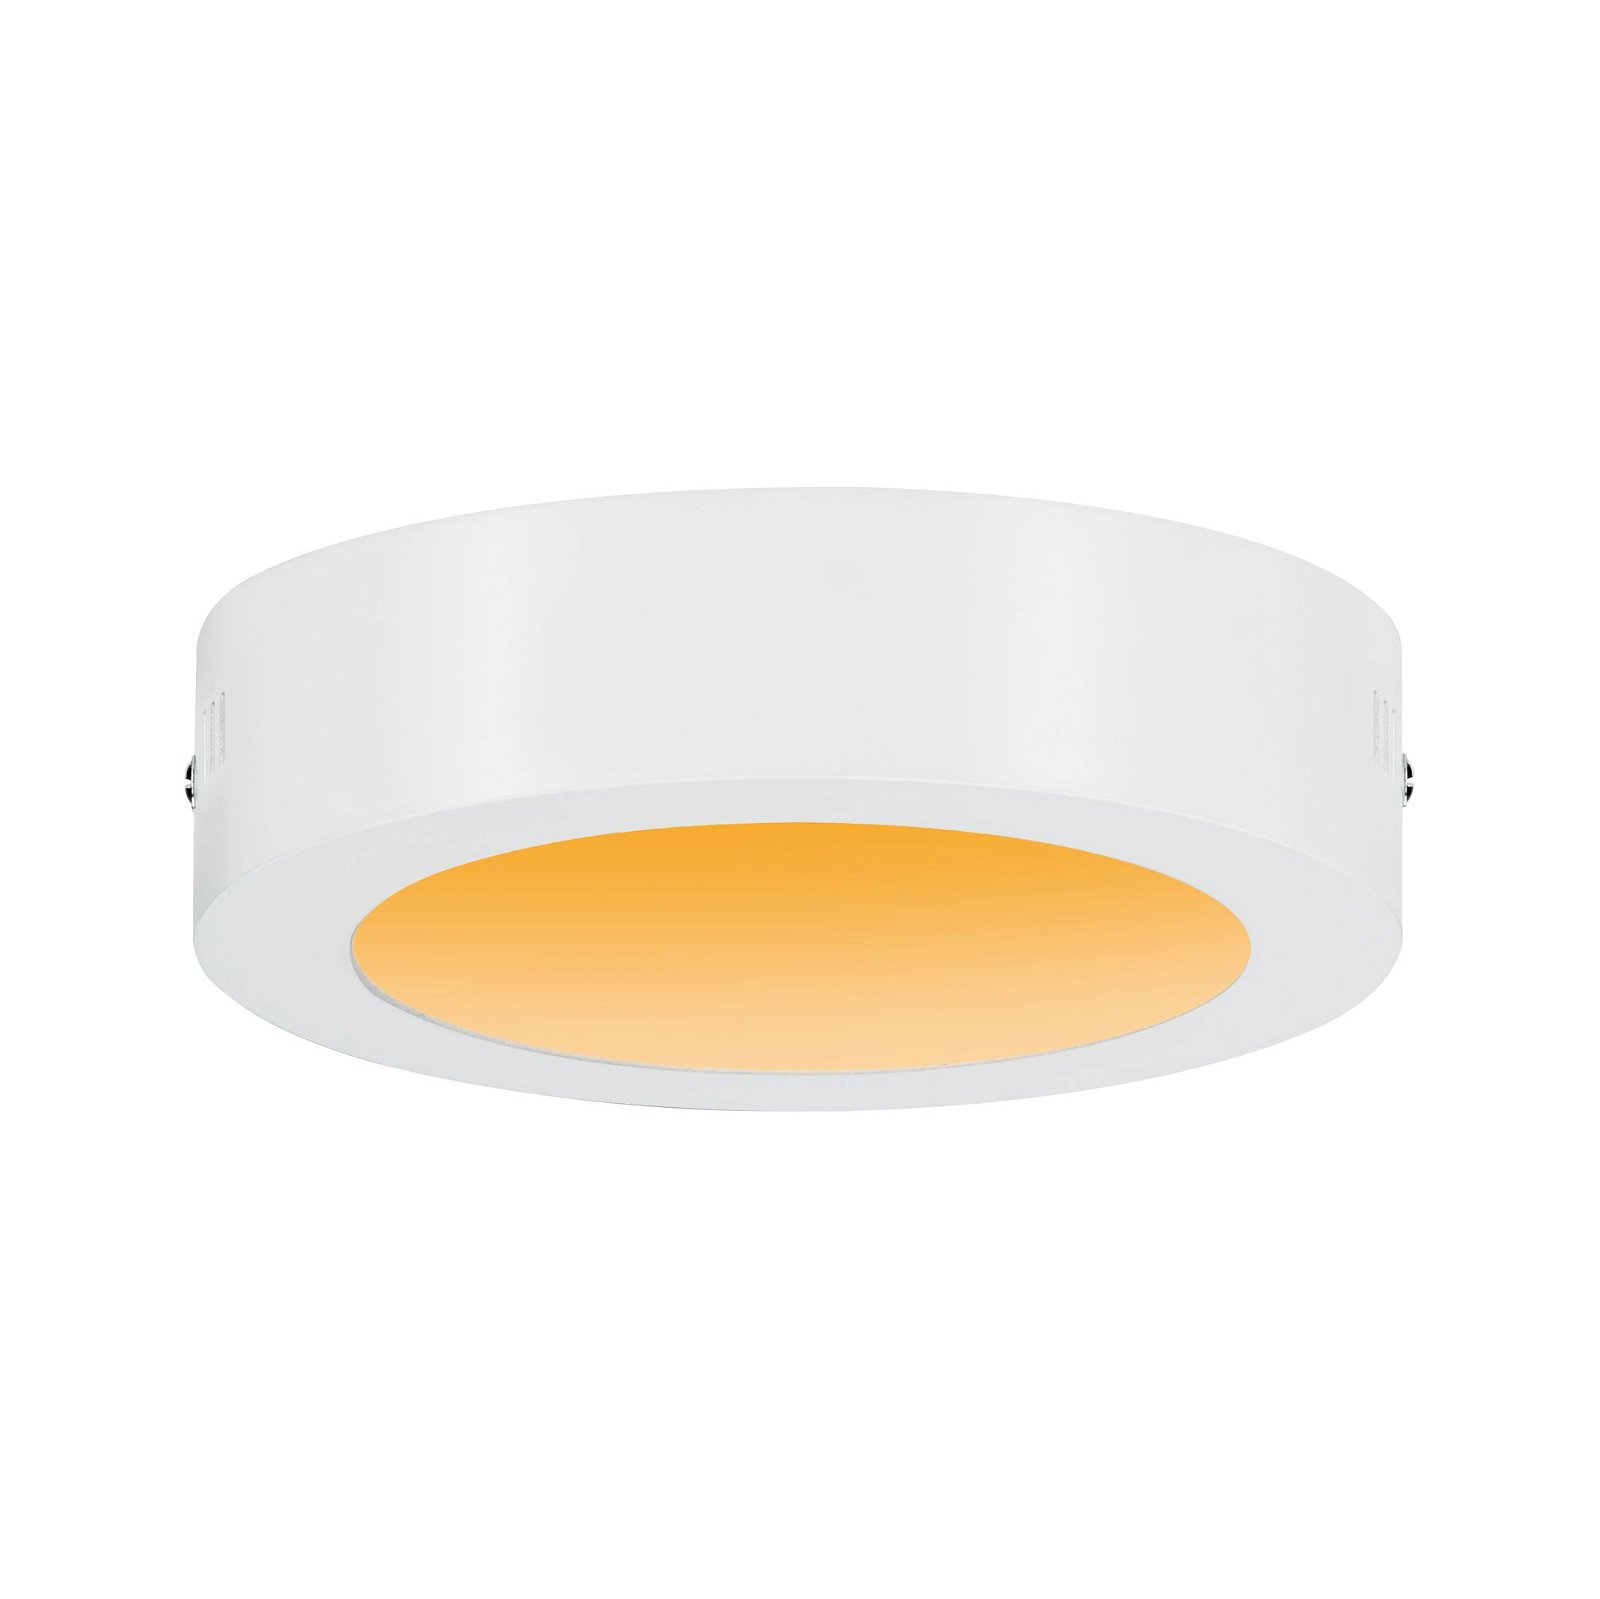 LED Panel Carpo Warm Dim rund 170mm 2300 - 3000K Weiß matt